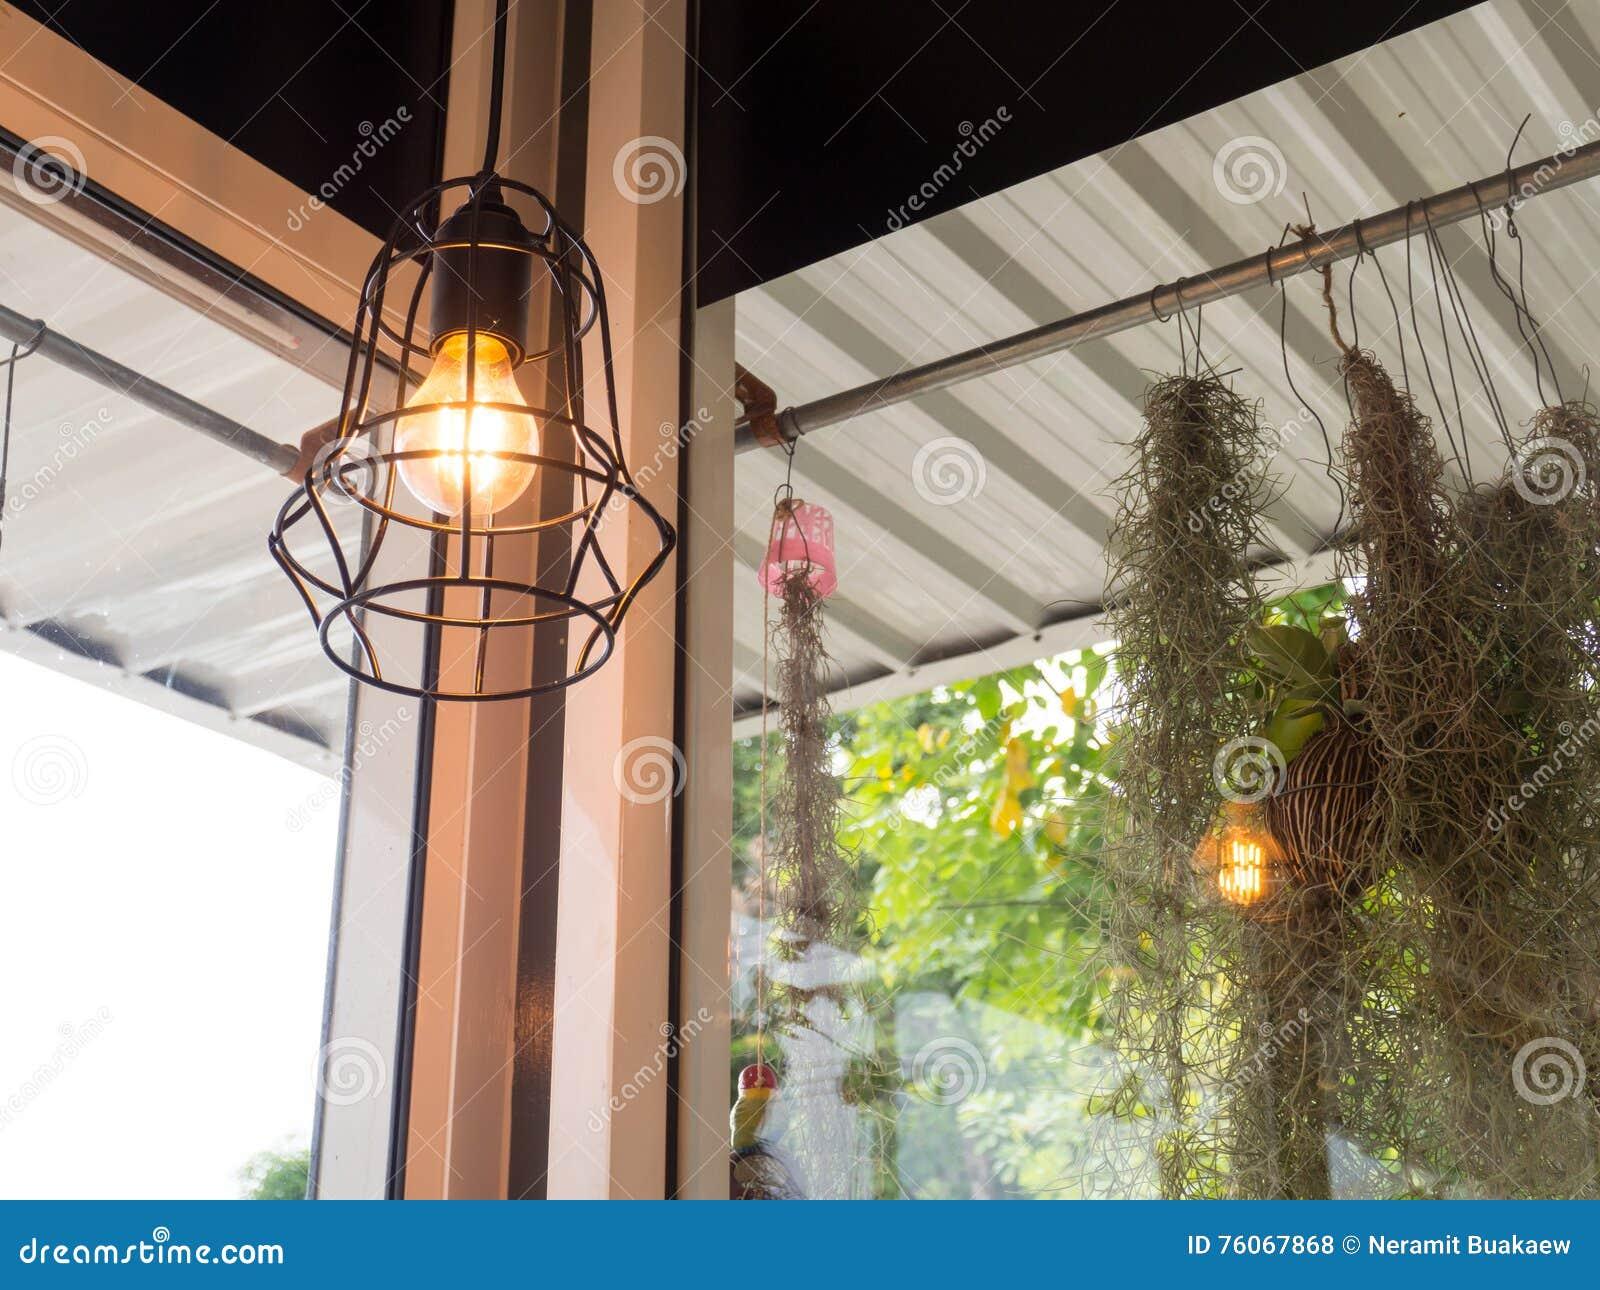 Moderne Lampen 68 : Edisons glühlampe und lampe in der modernen art warme